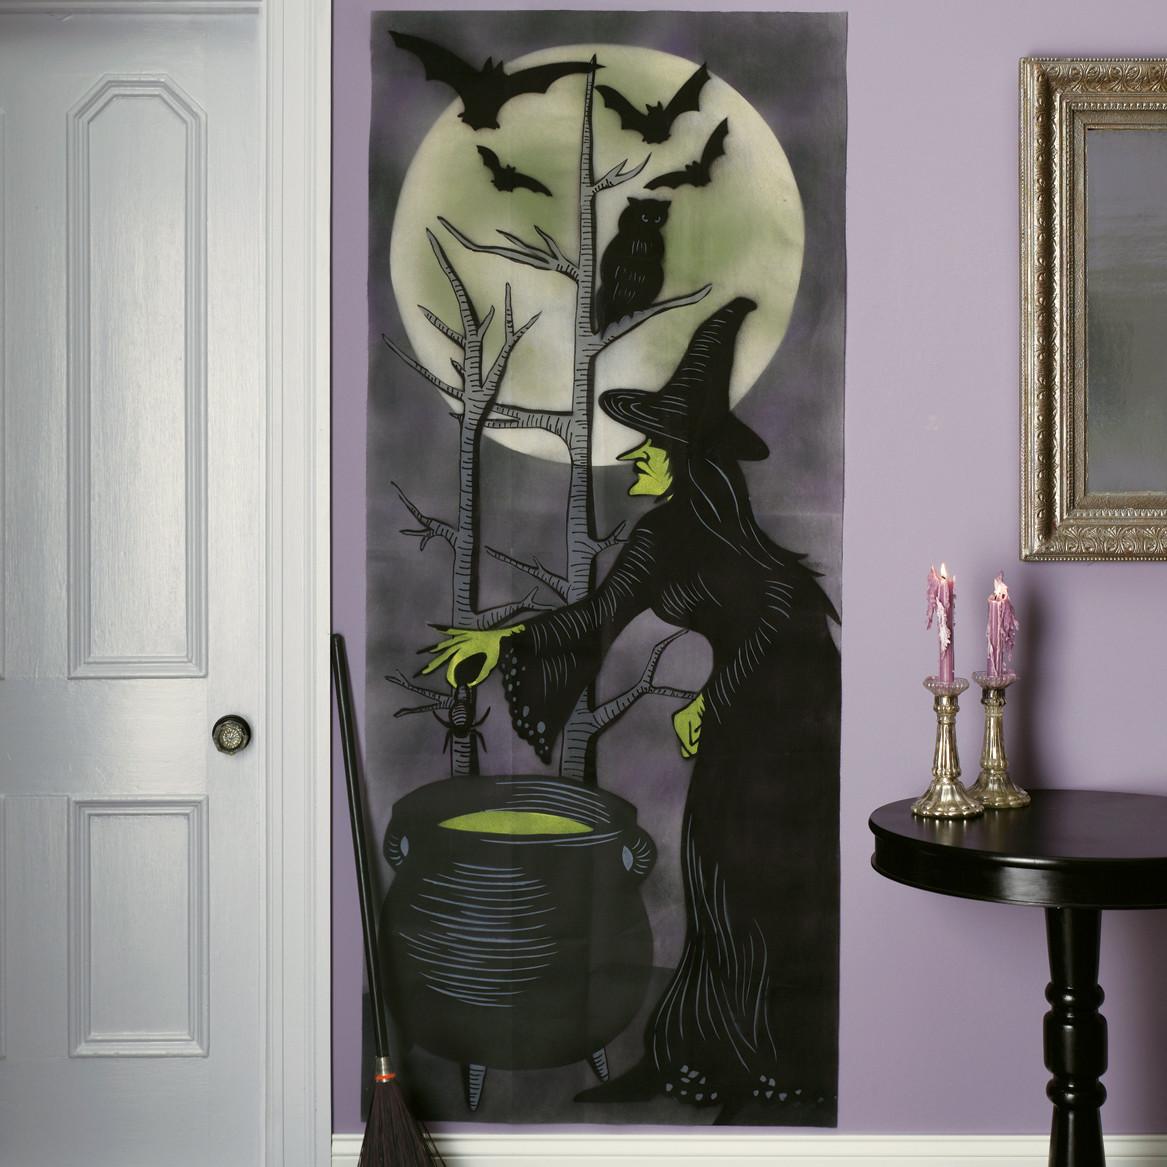 halloween witch decorations sale interior design ideas halloween decor sale - Halloween Witch Decorations